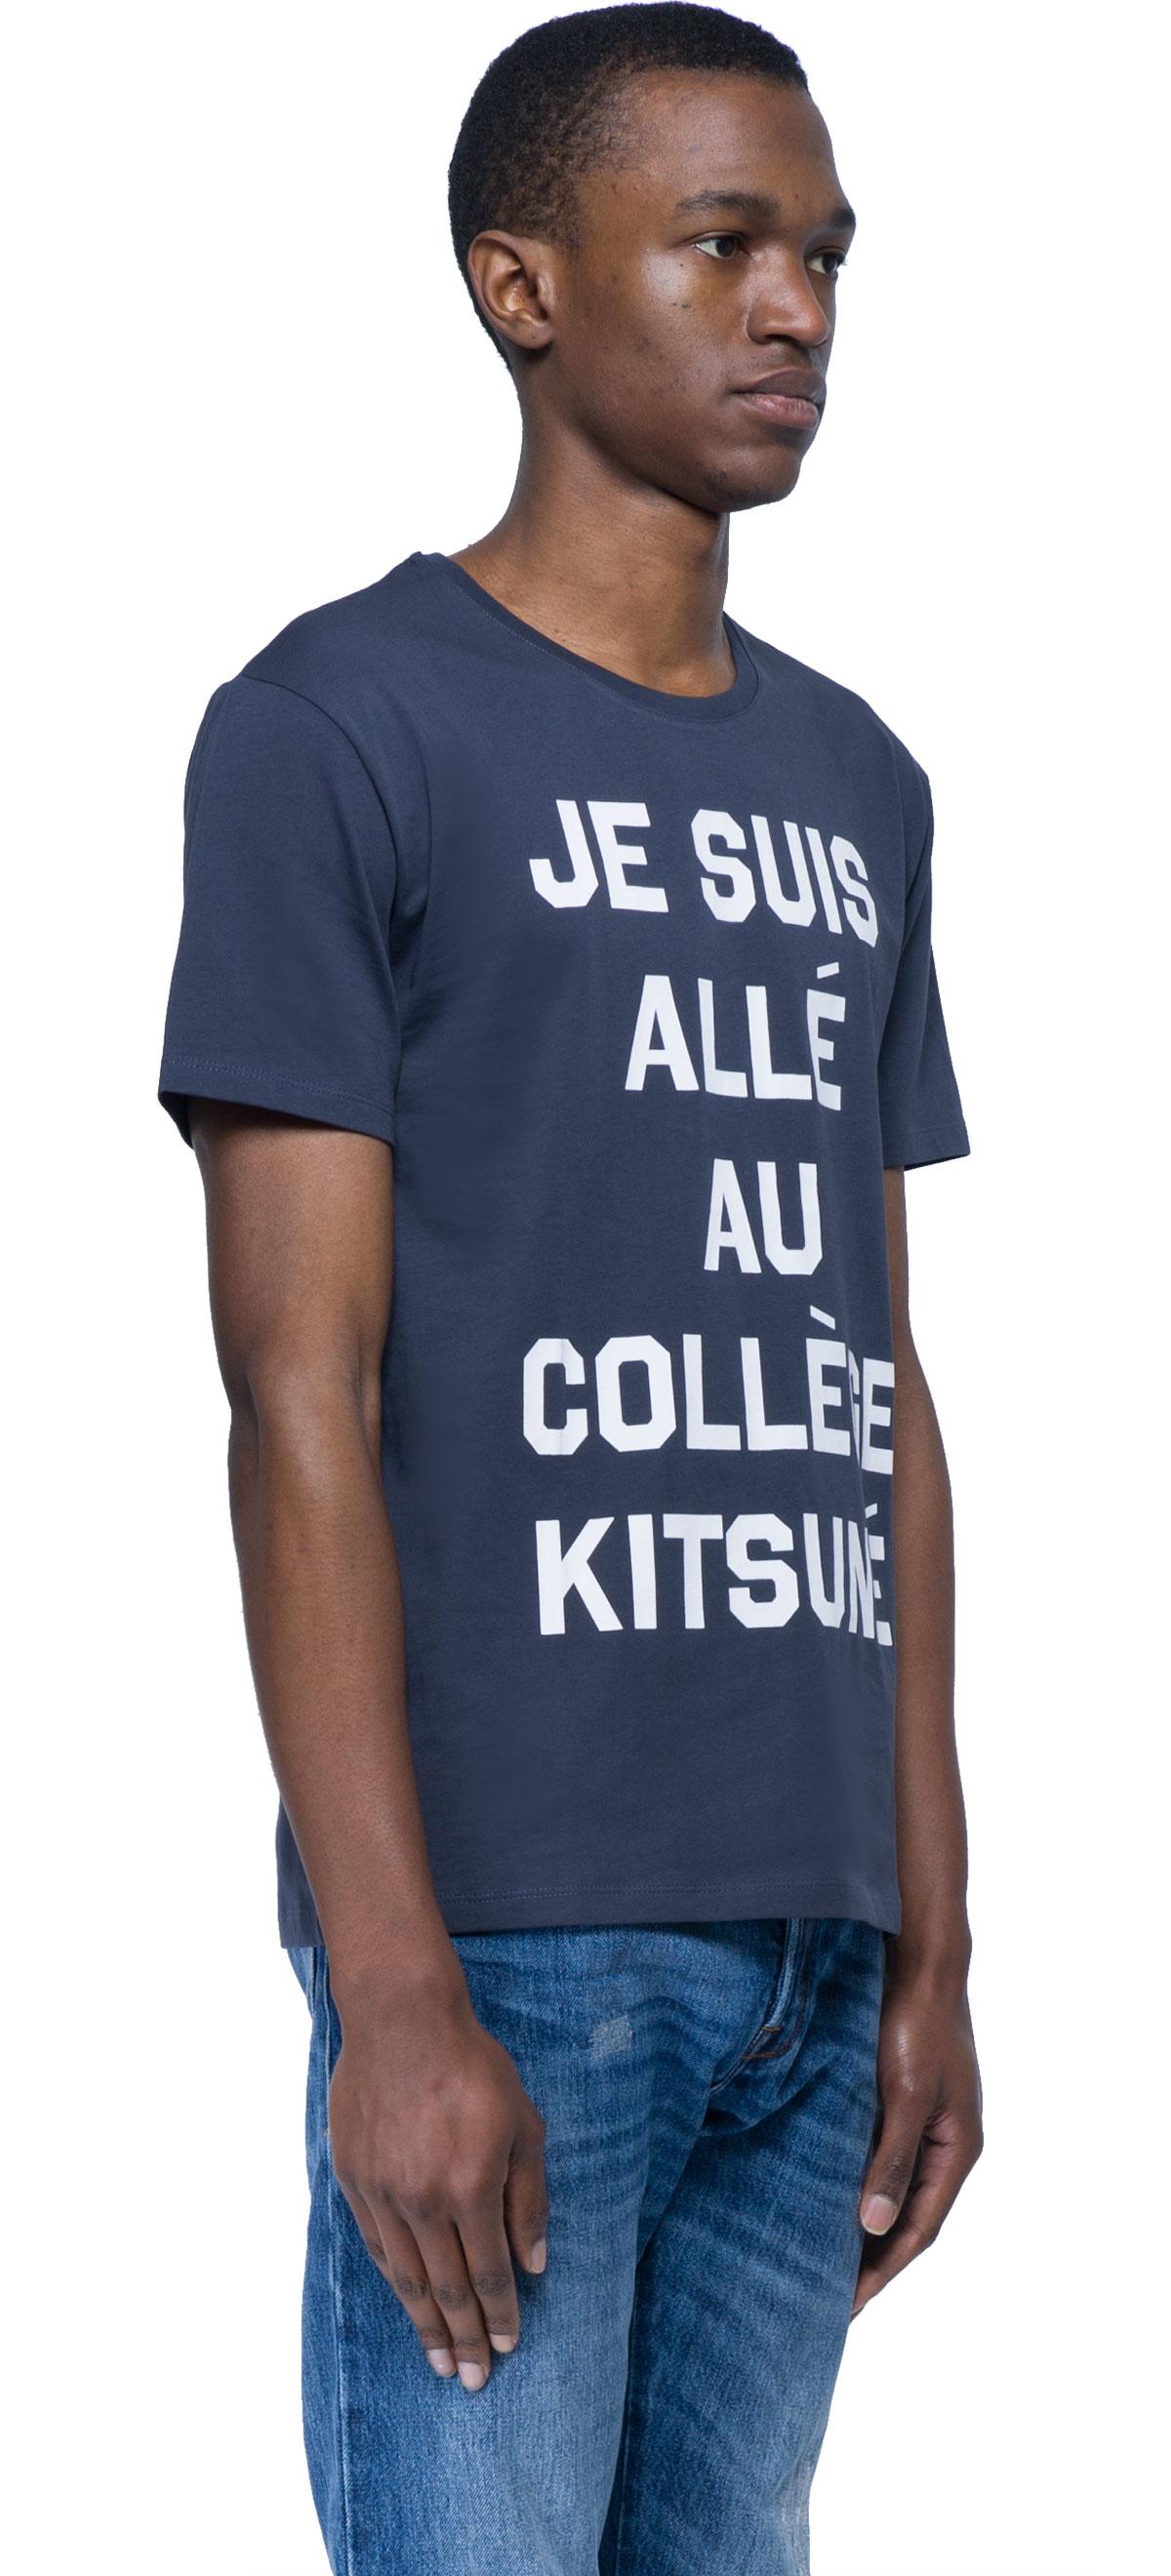 Maison kitsun coll ge kitsun t shirt in blue for men lyst for T shirts for college guys